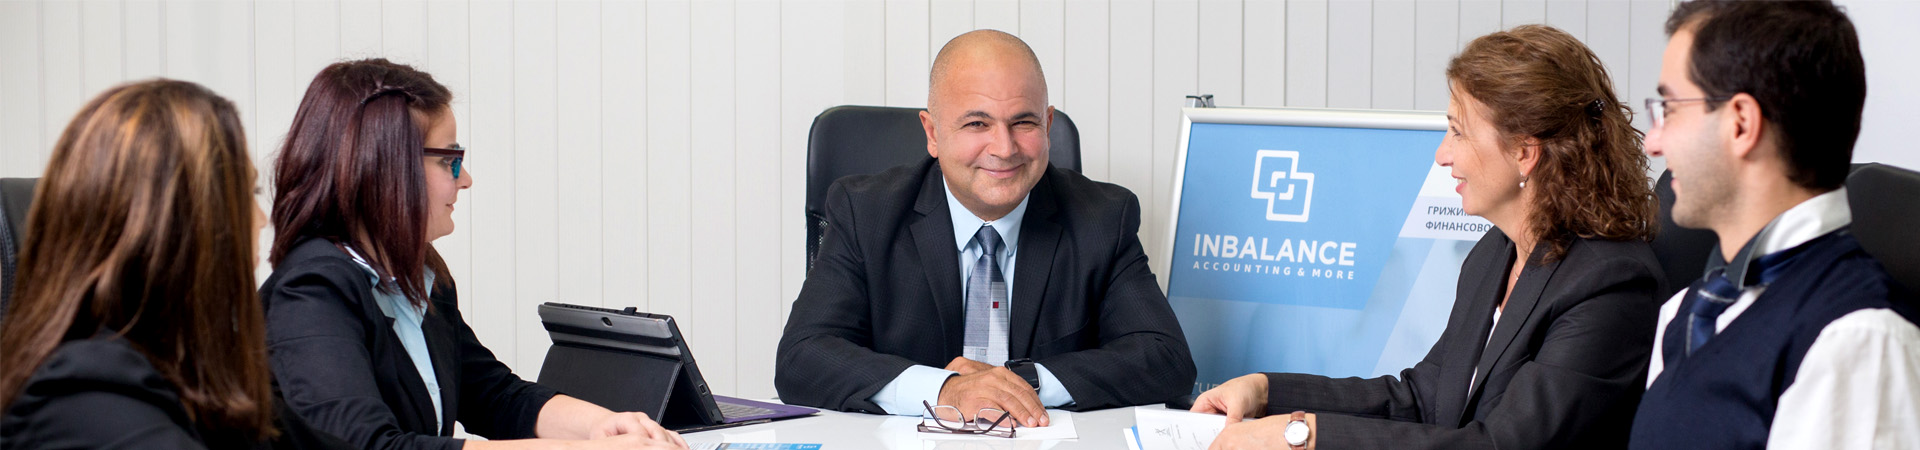 Accounting company InBalance Plovdiv - inb.bg